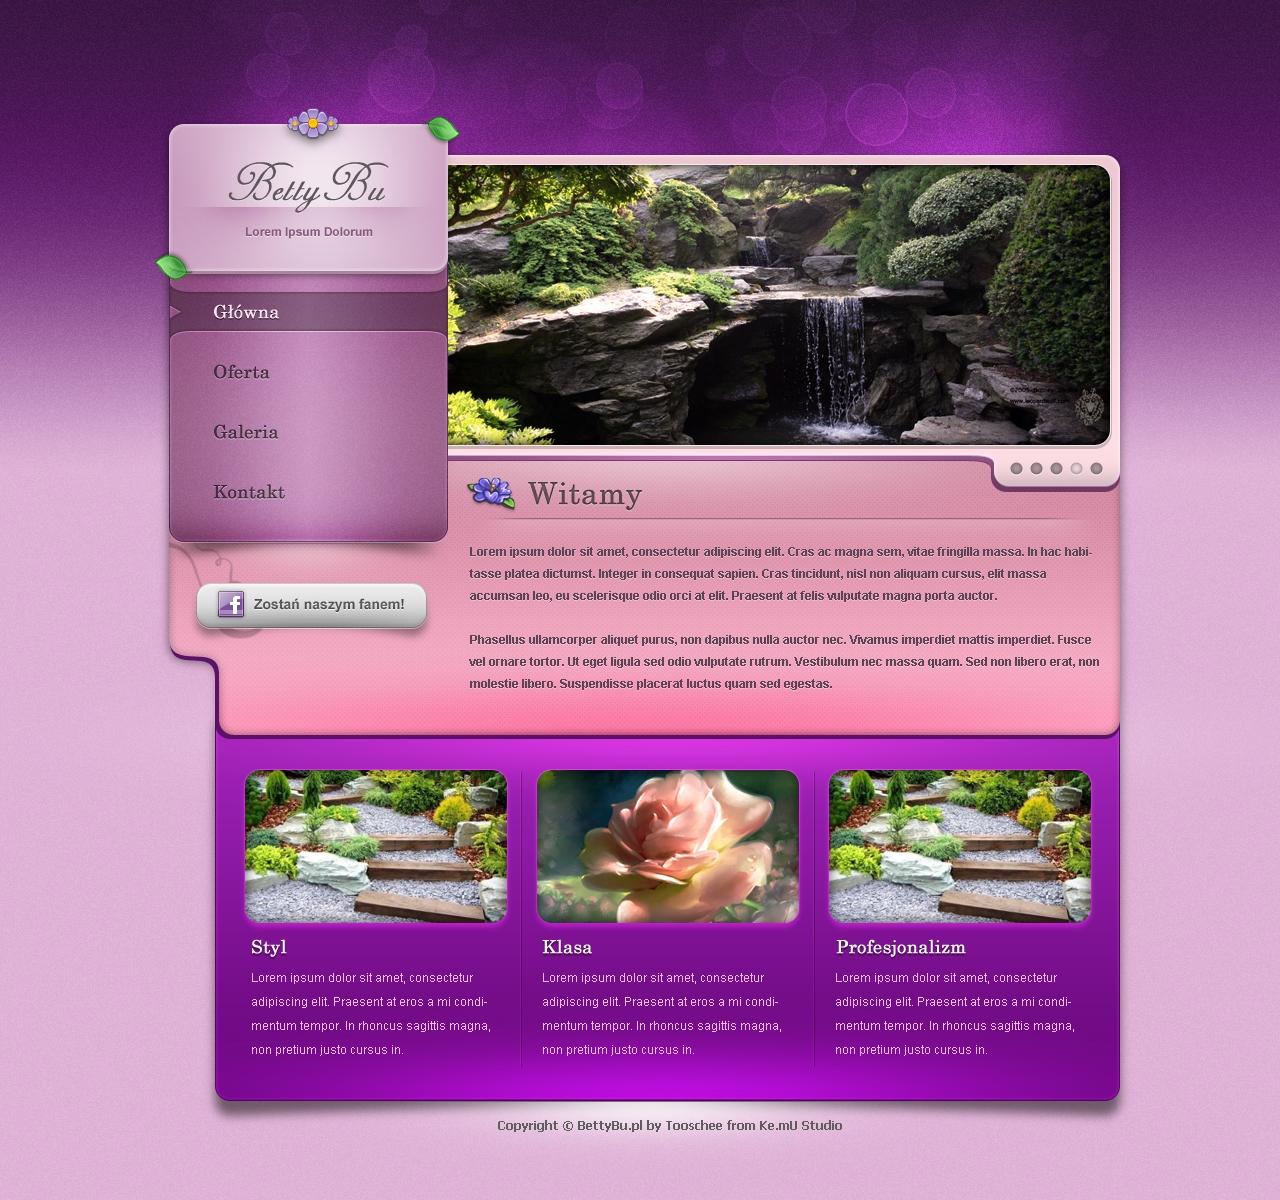 BettyBu Garden Company